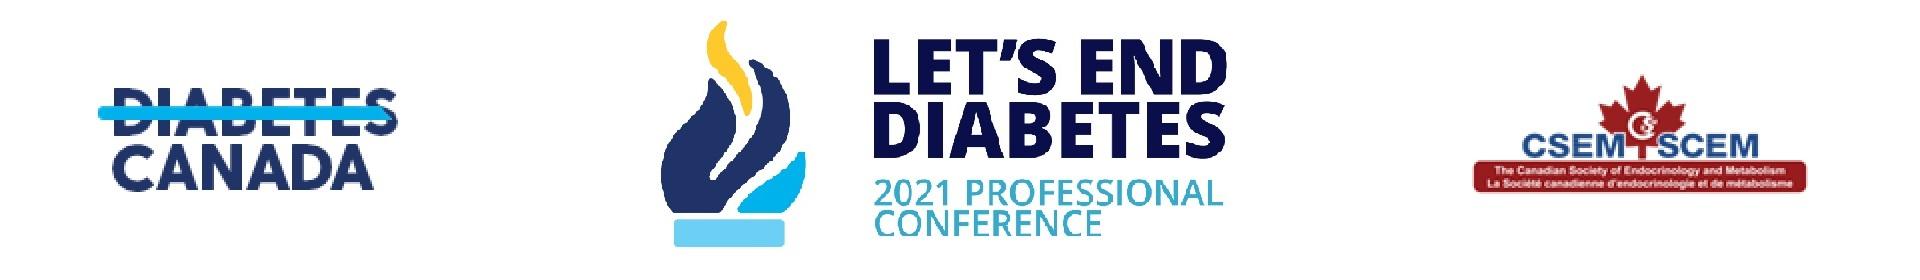 2021 Diabetes Canada/CSEM Professional Conference Event Banner